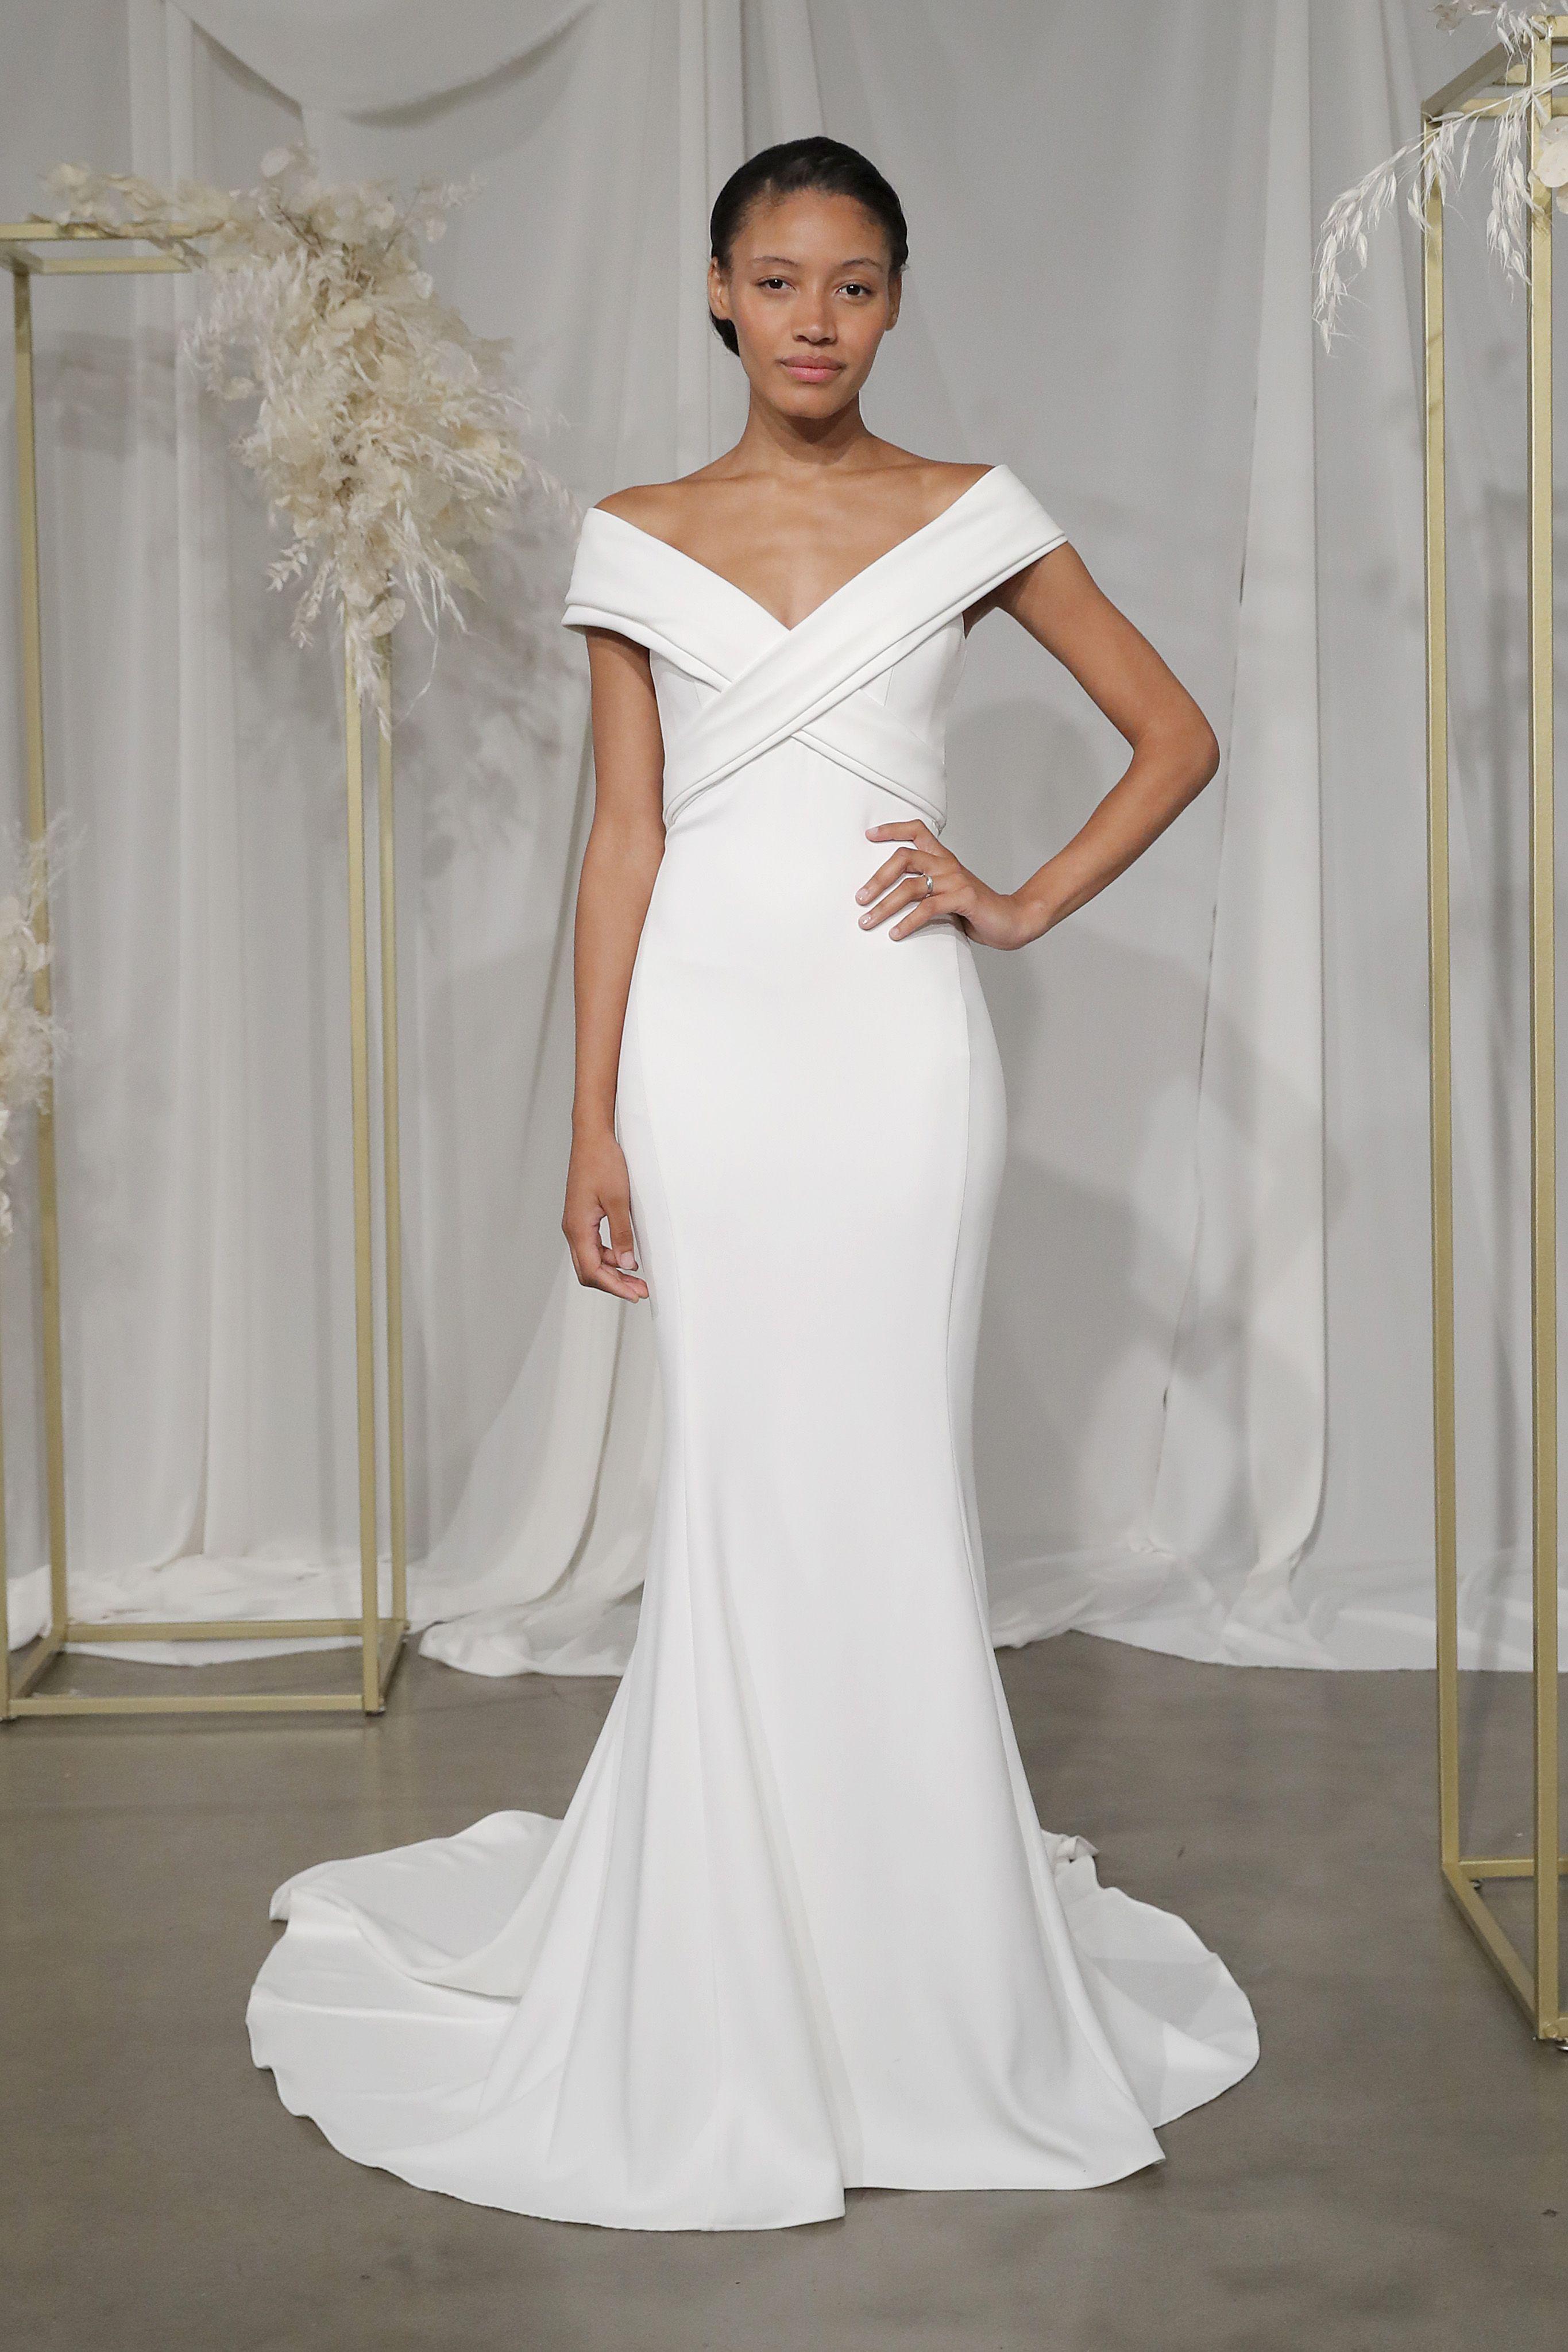 Shiri By Nouvelle Amsale Amsale Bridal Amsale Wedding Dress Bridal Gowns Mermaid